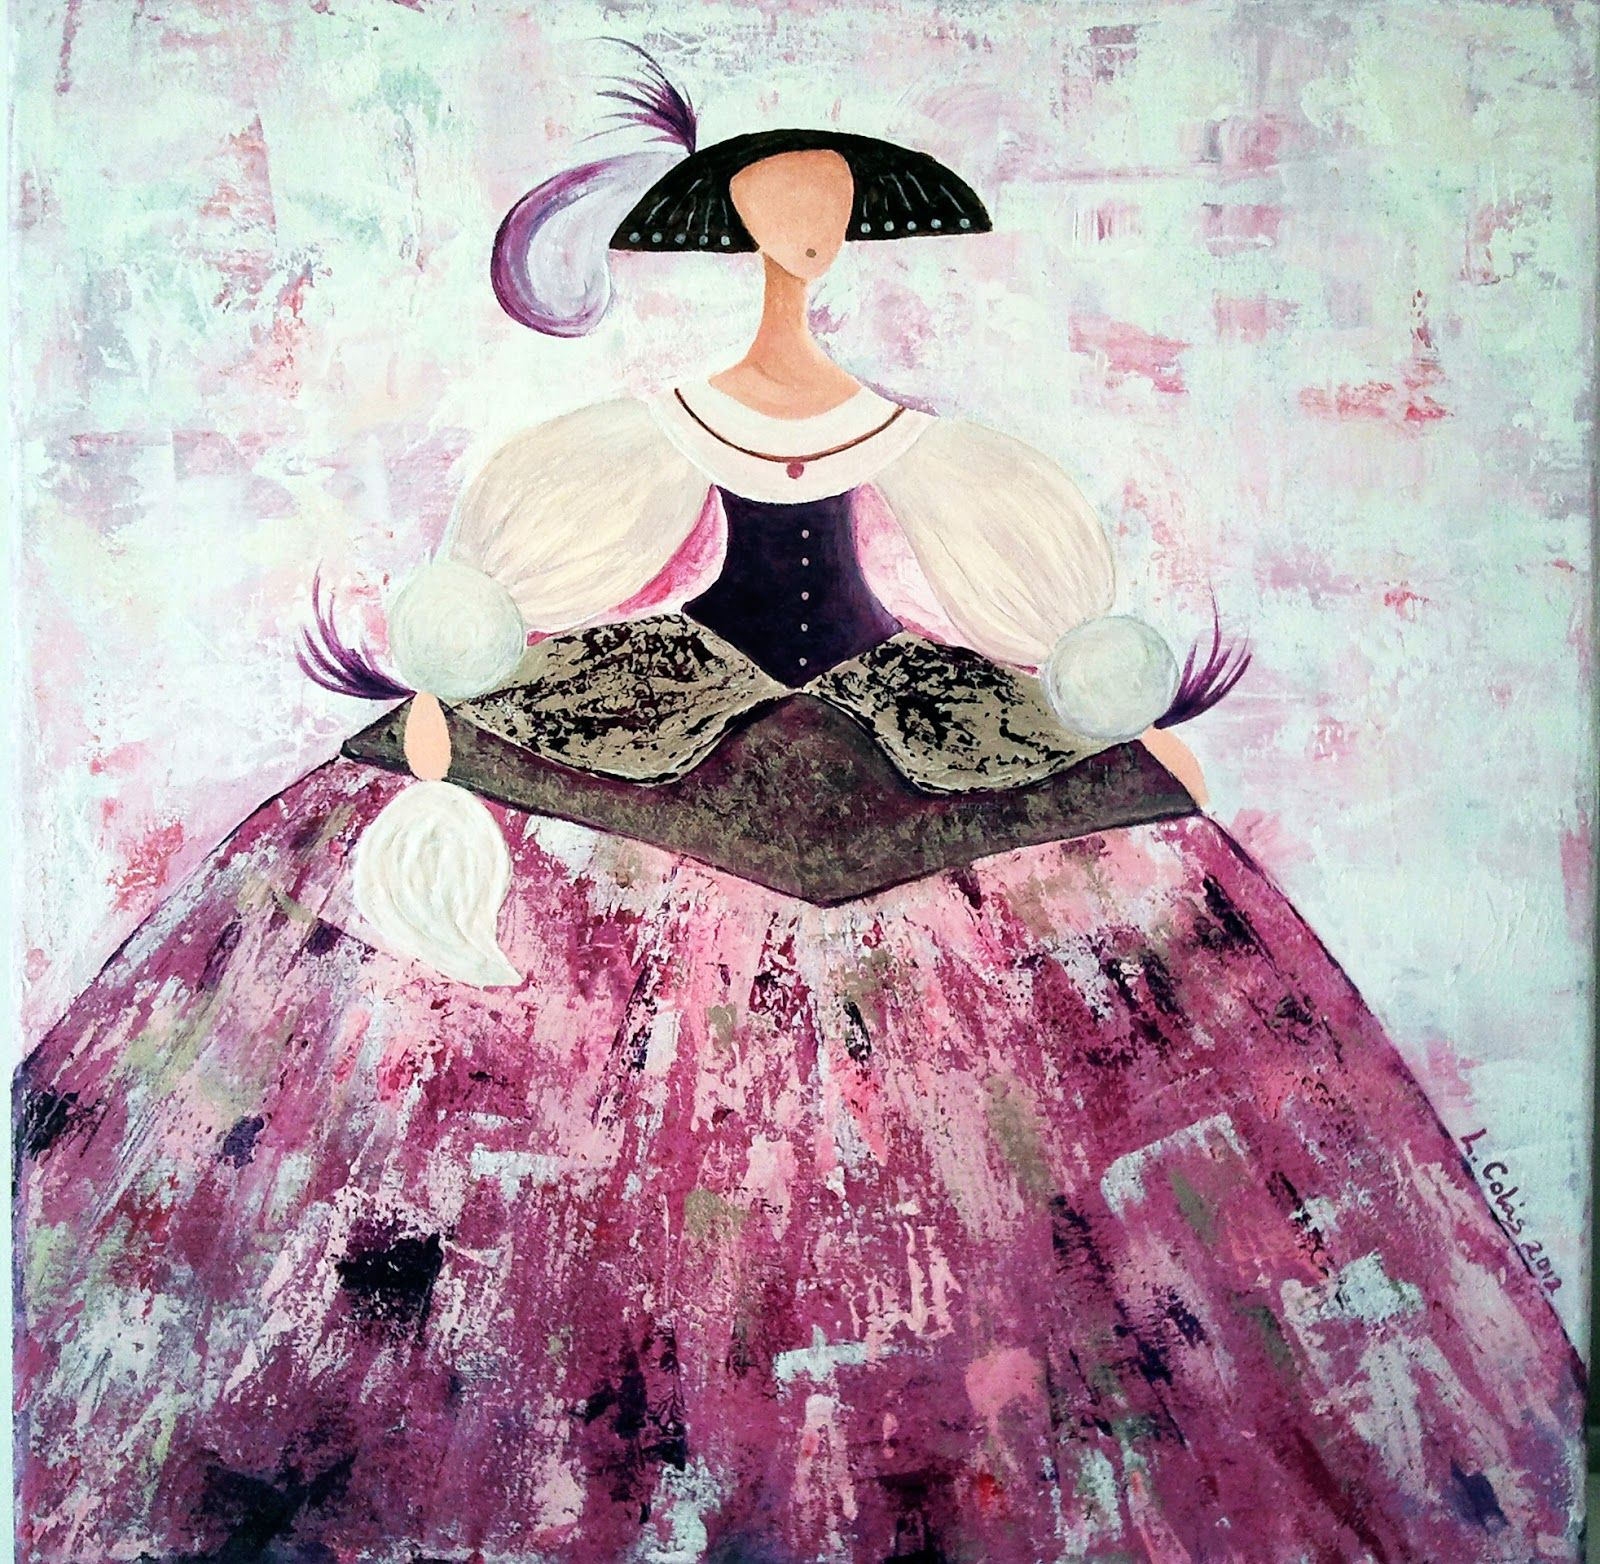 Meninas buscar con google meninas arte pintura - Cuadros de meninas modernos ...